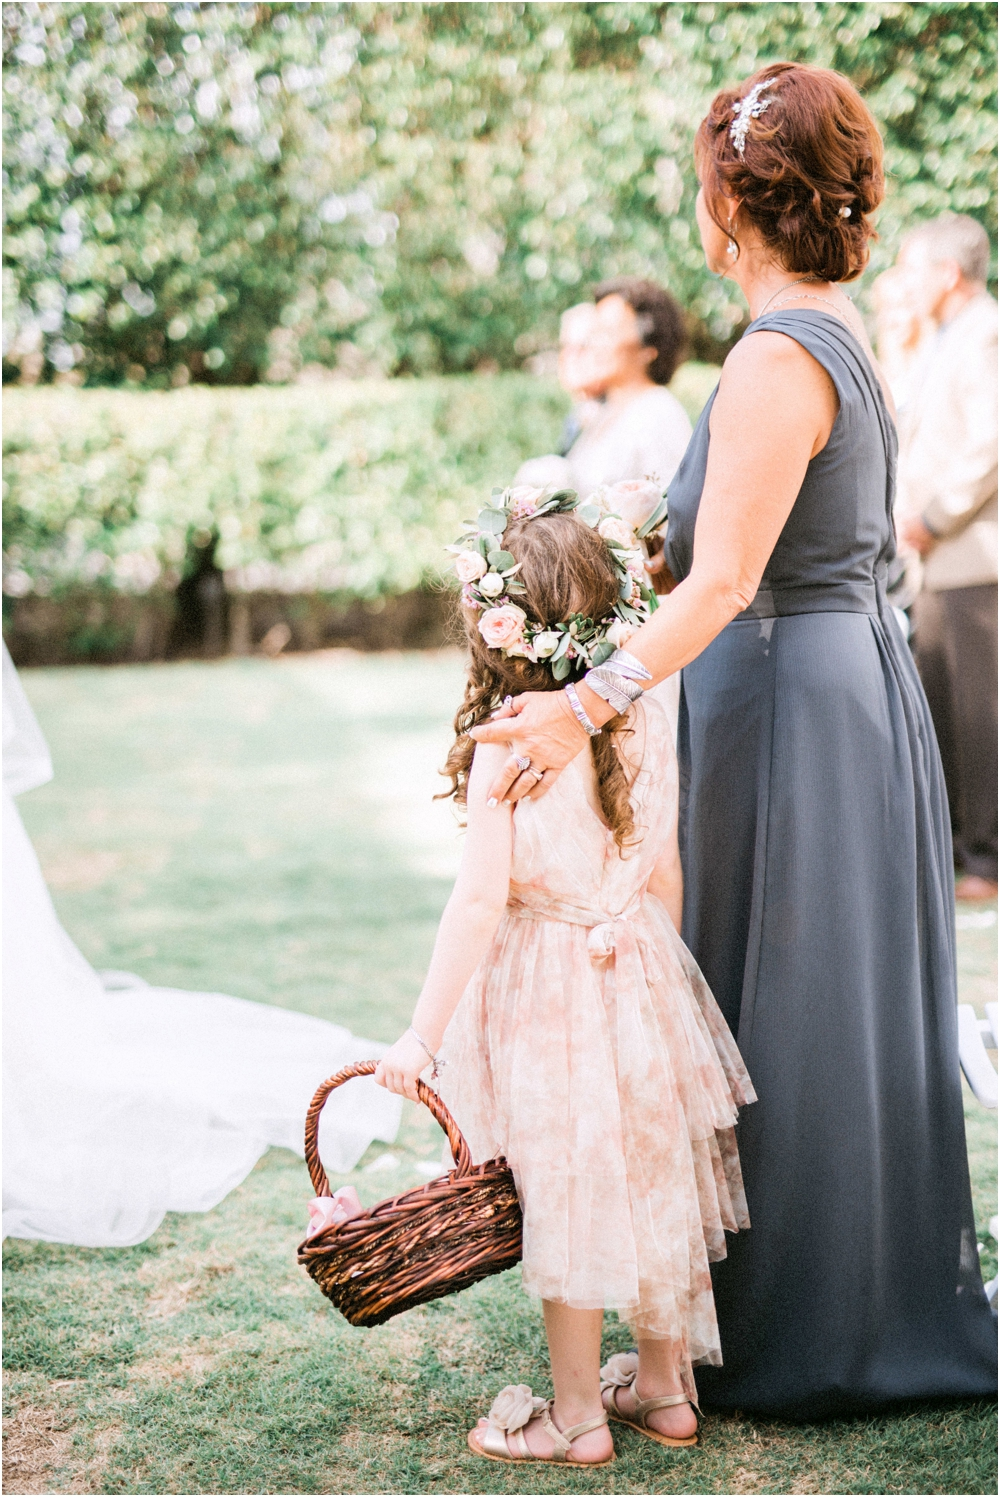 Film_Wedding_Photographer_Hyatt_Regency_Coconut_Point_Wedding_1185.jpg